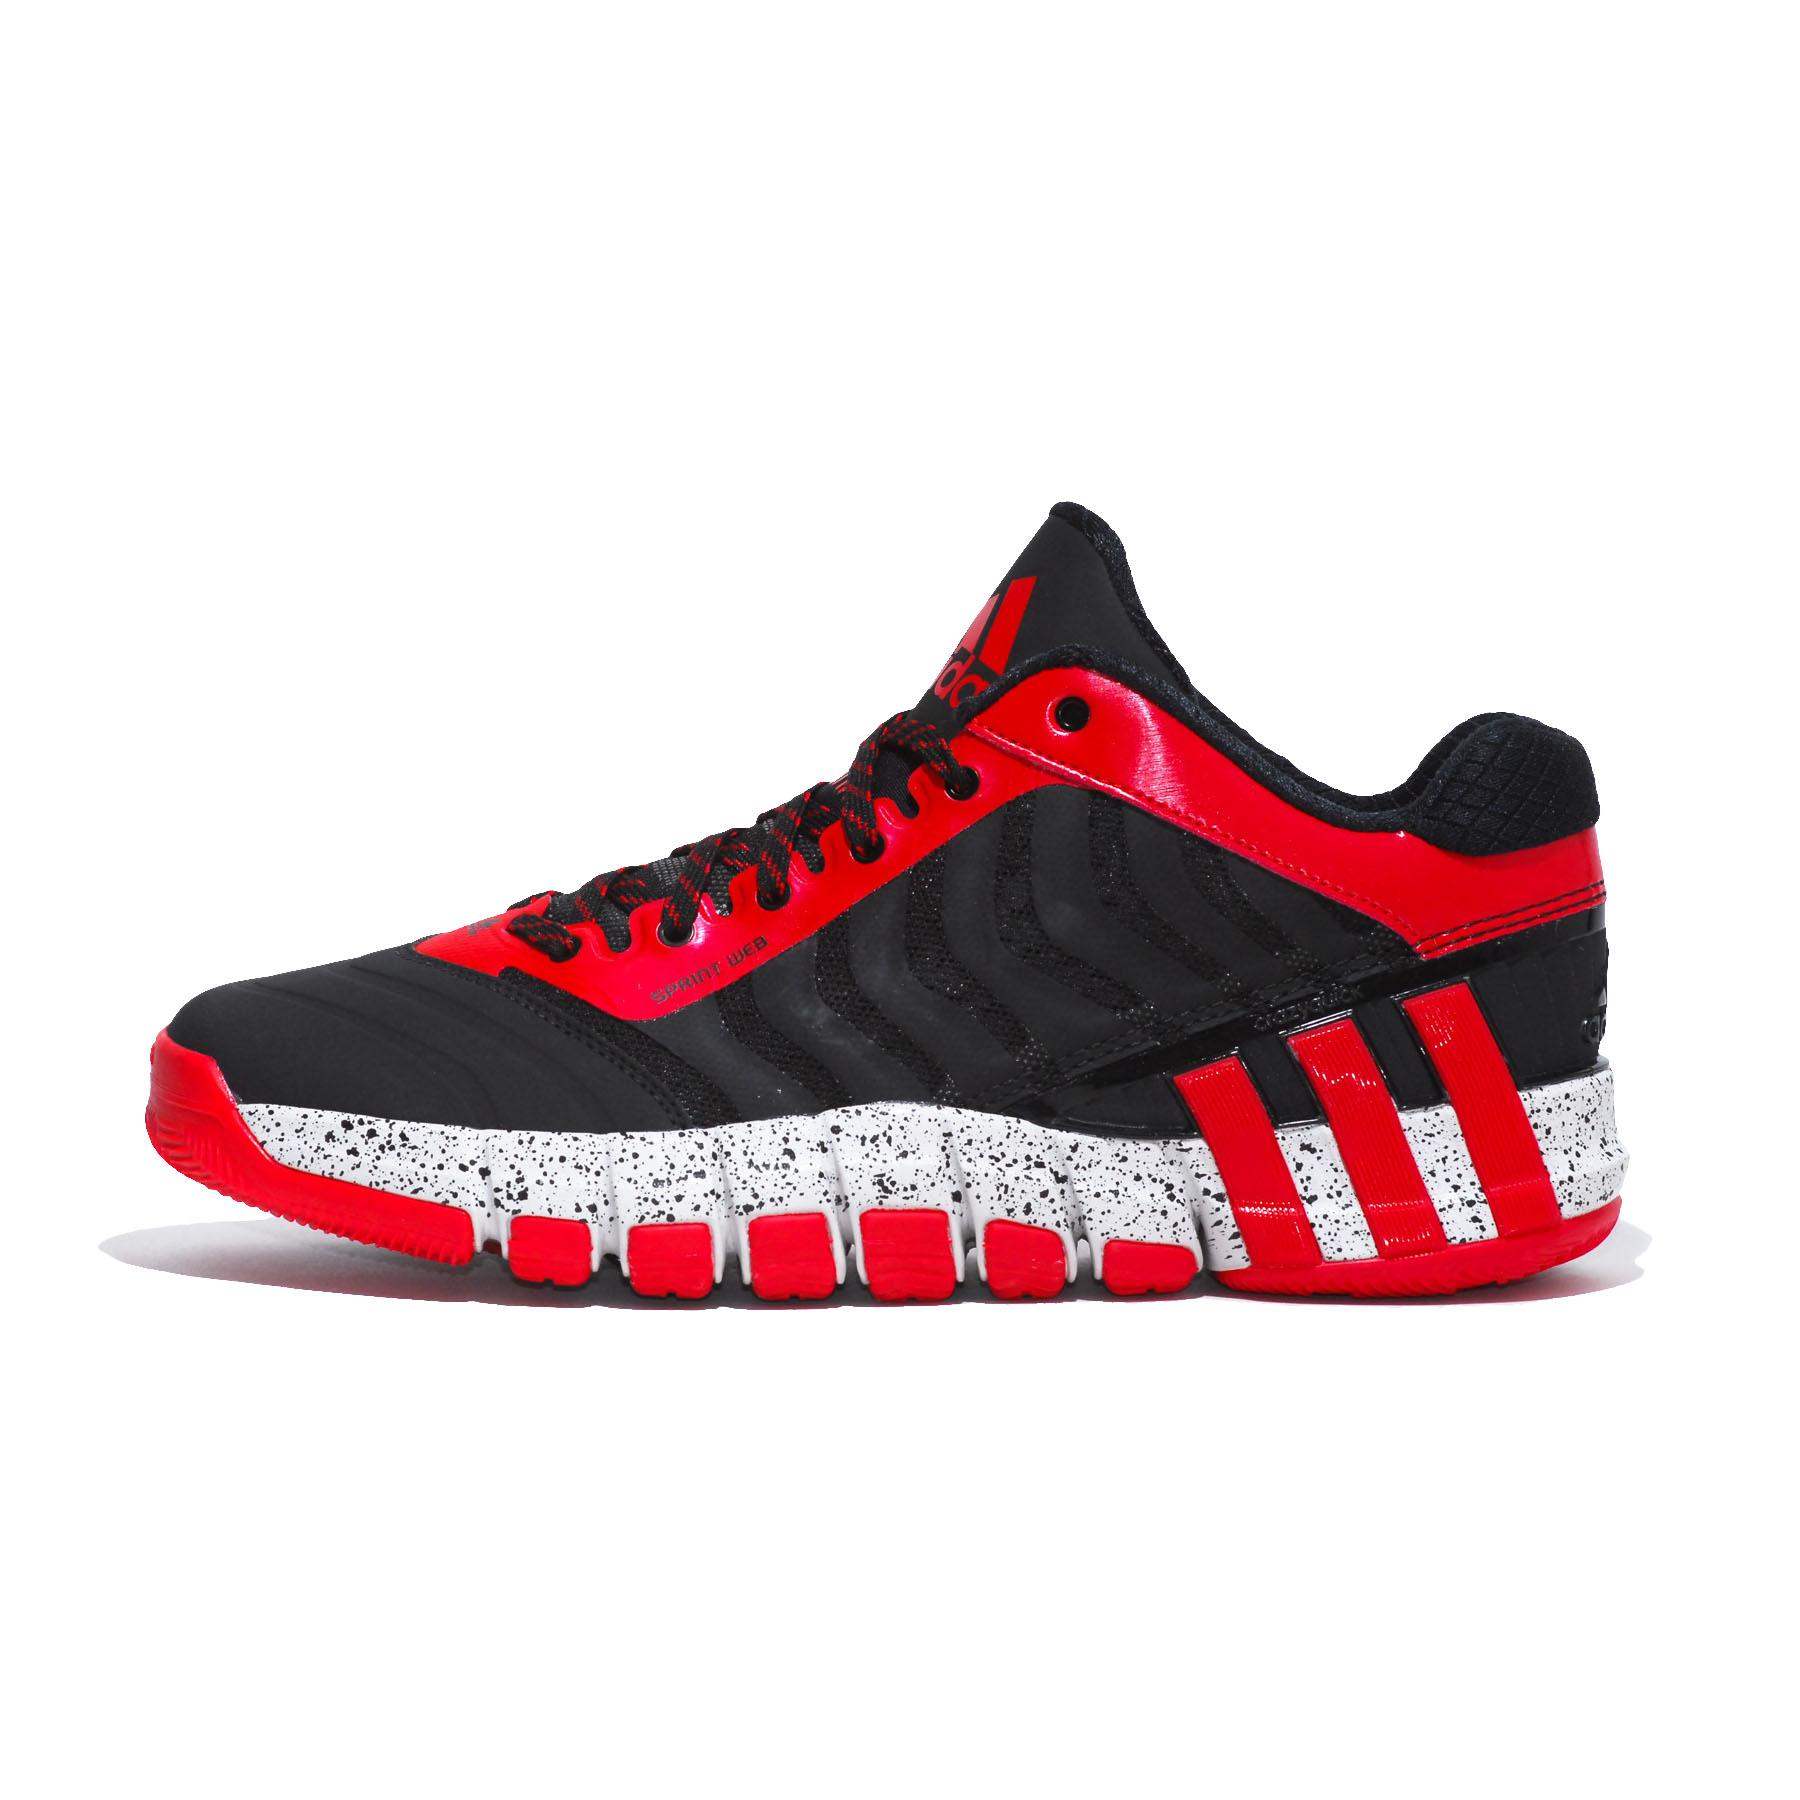 adidas-jl7-quickvsfast-20